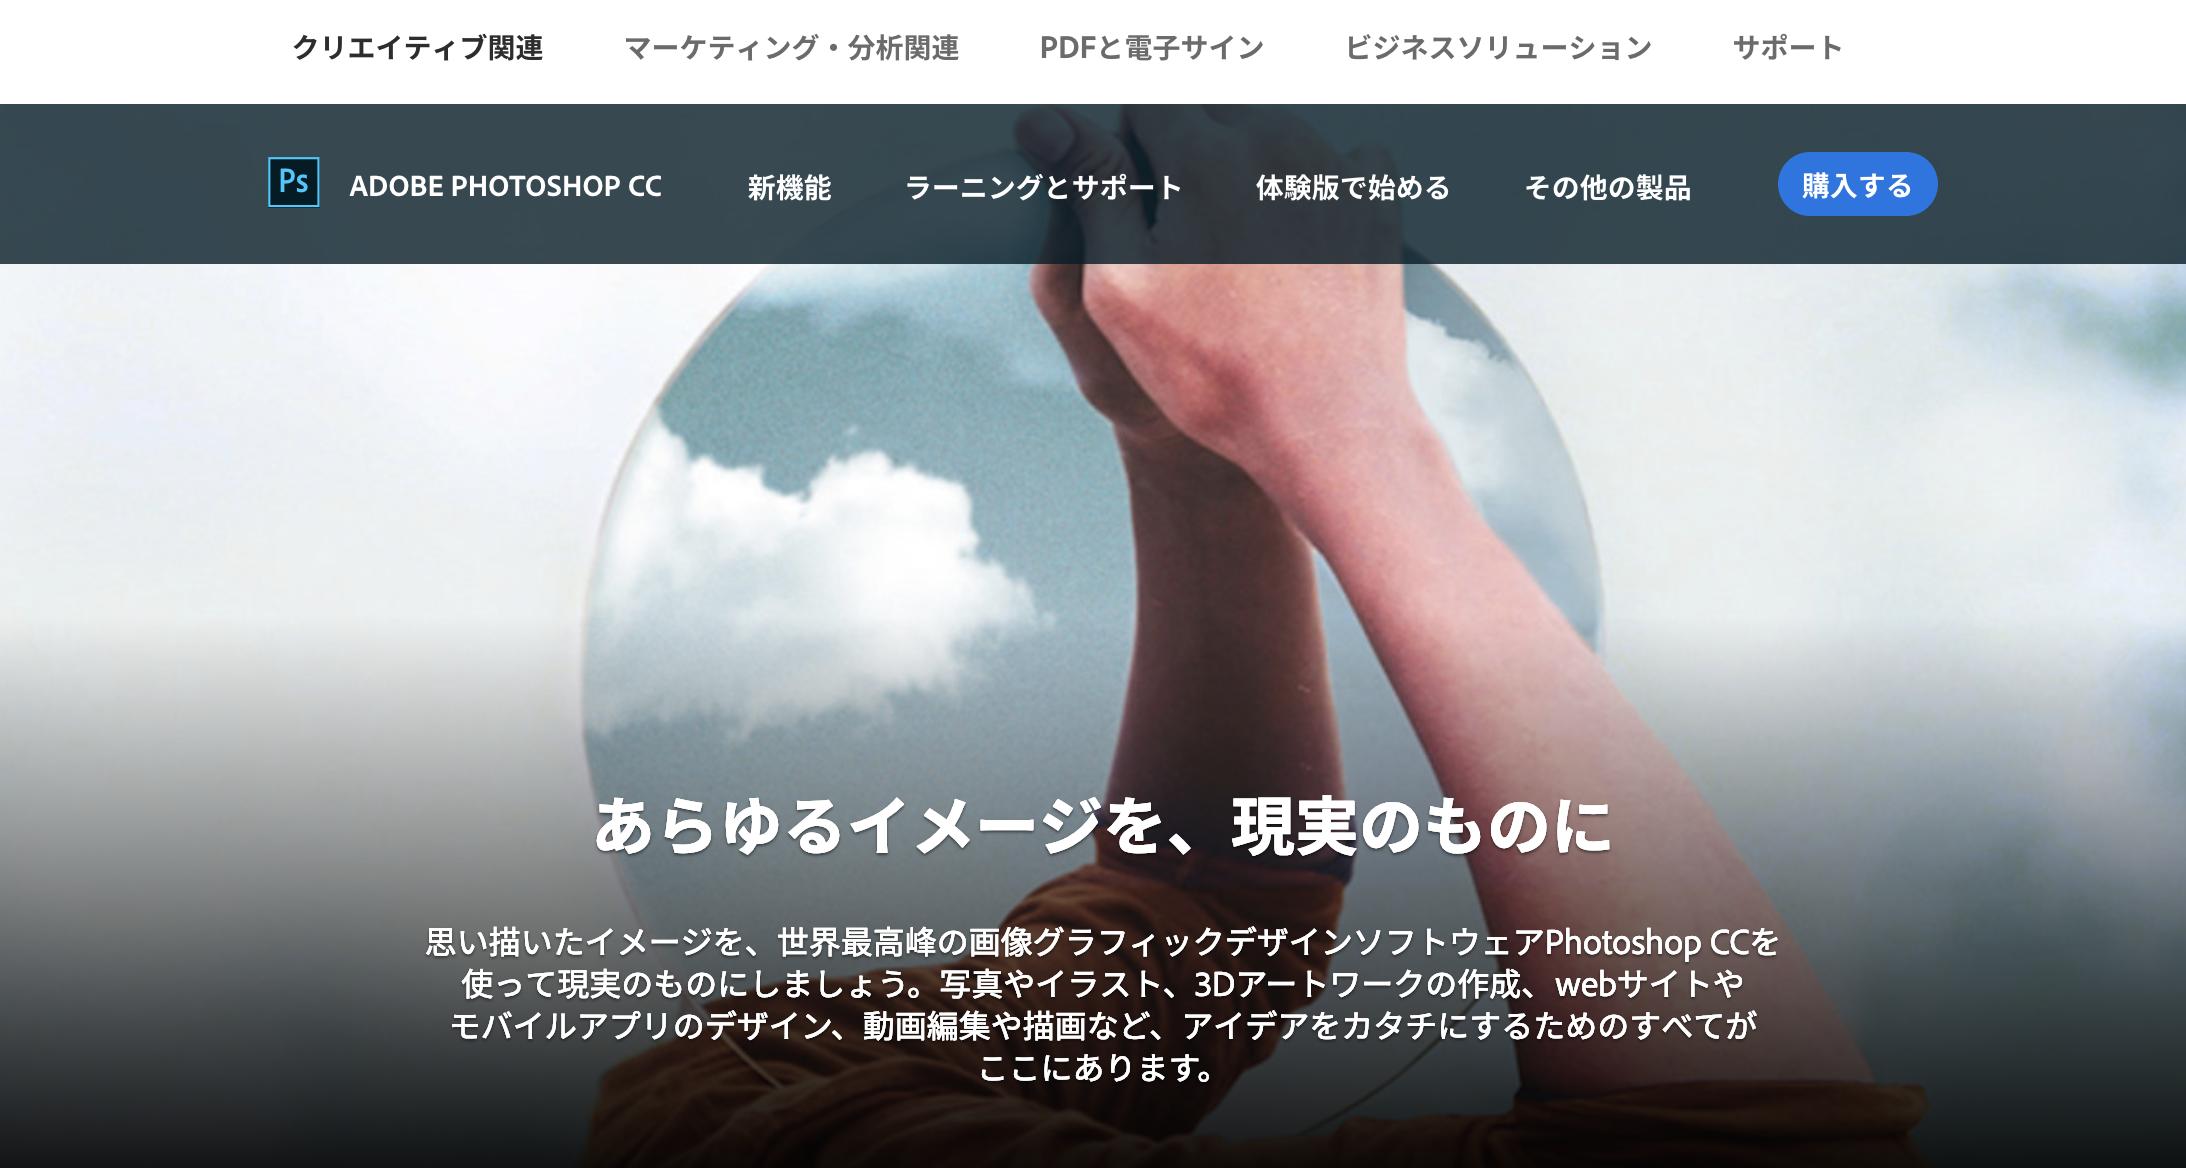 Adobe Photoshop_トップページ